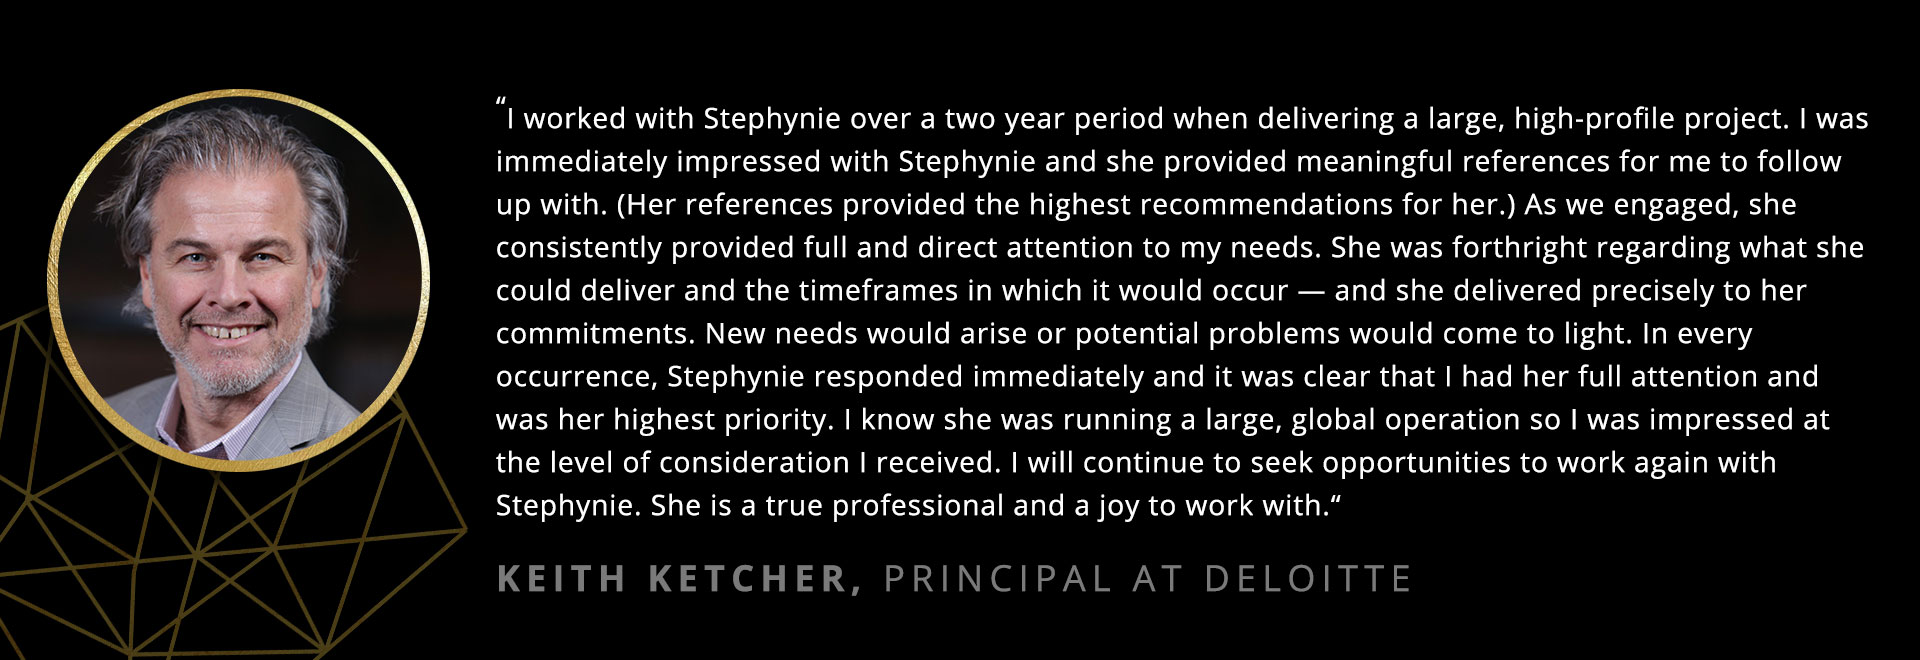 Testimonial_Ketcher.jpg